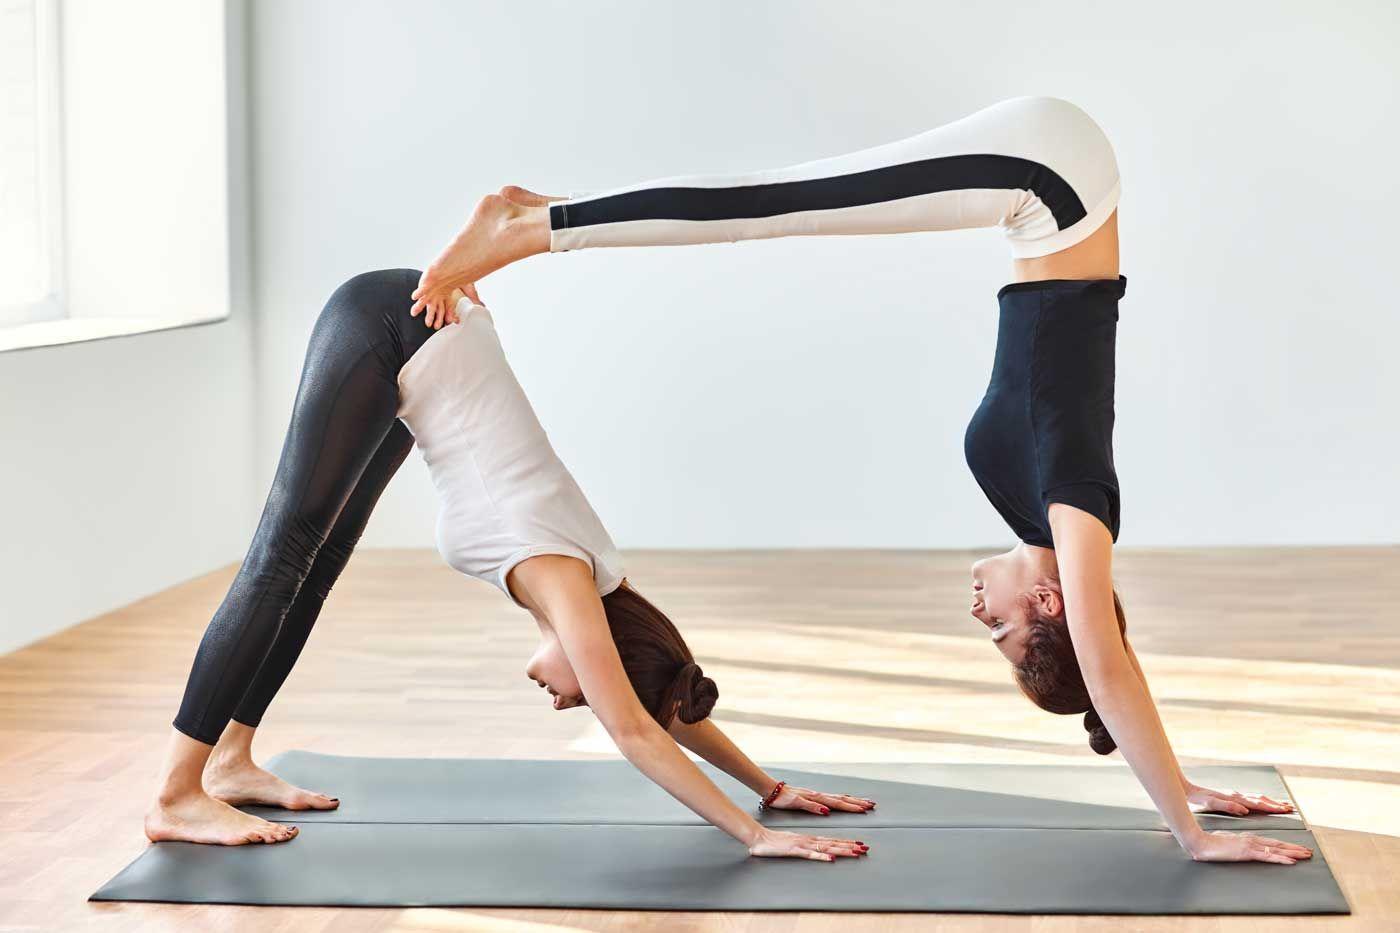 partner yoga double down dog Yoga